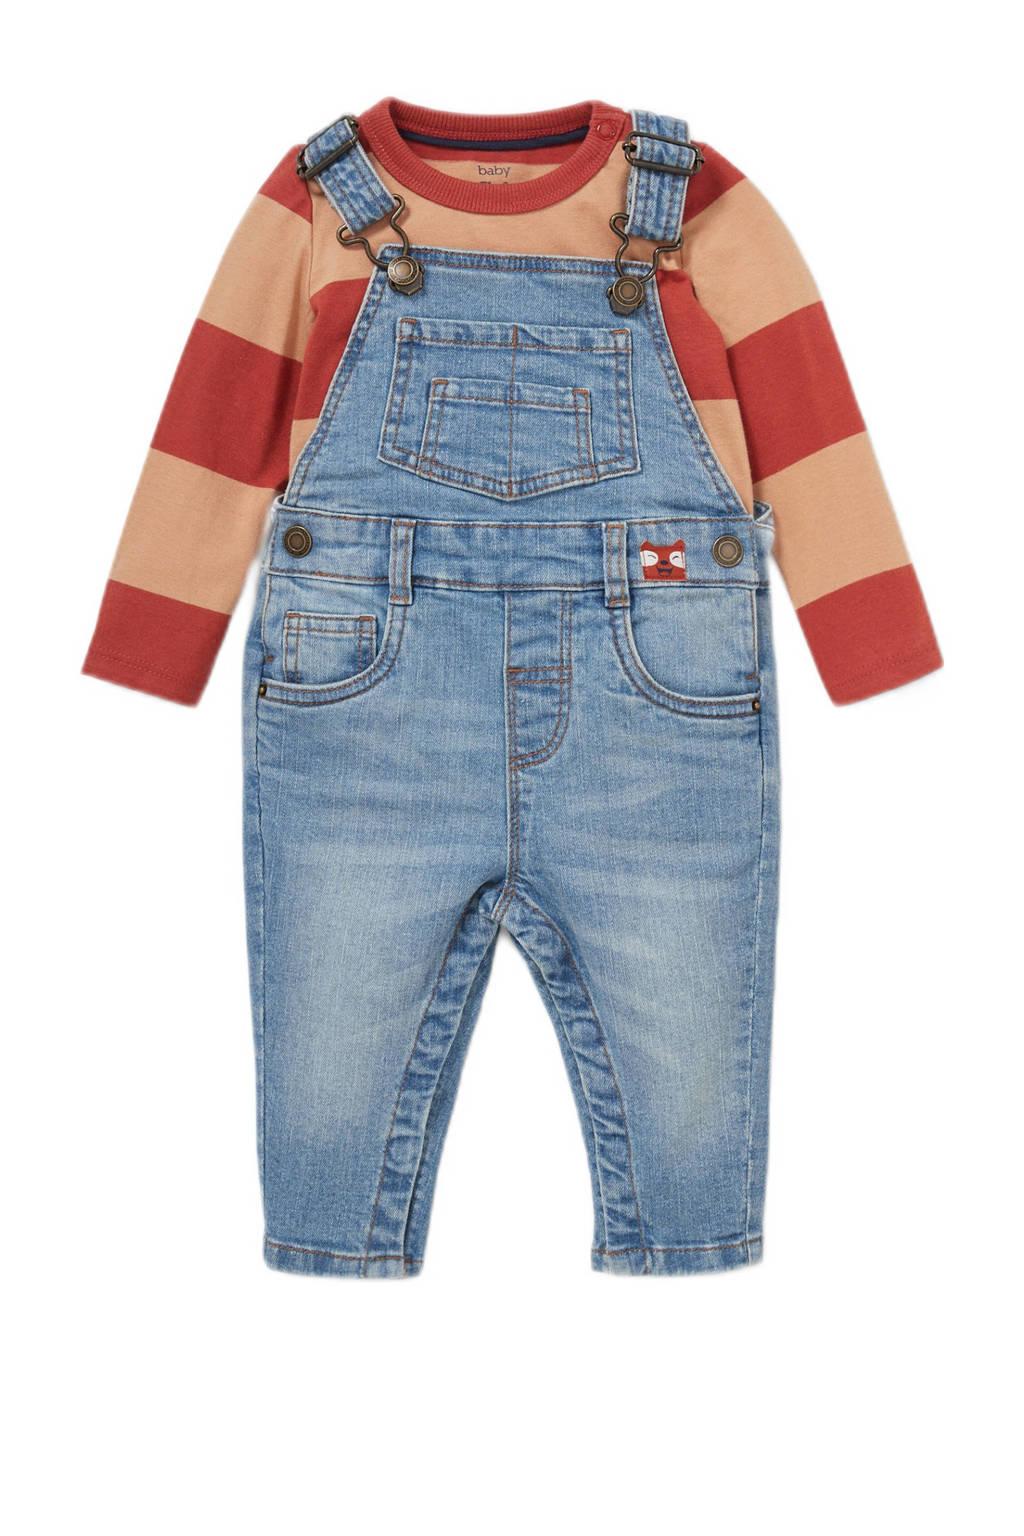 C&A Baby Club denim tuinbroek + longsleeve, Roodbruin/blauw